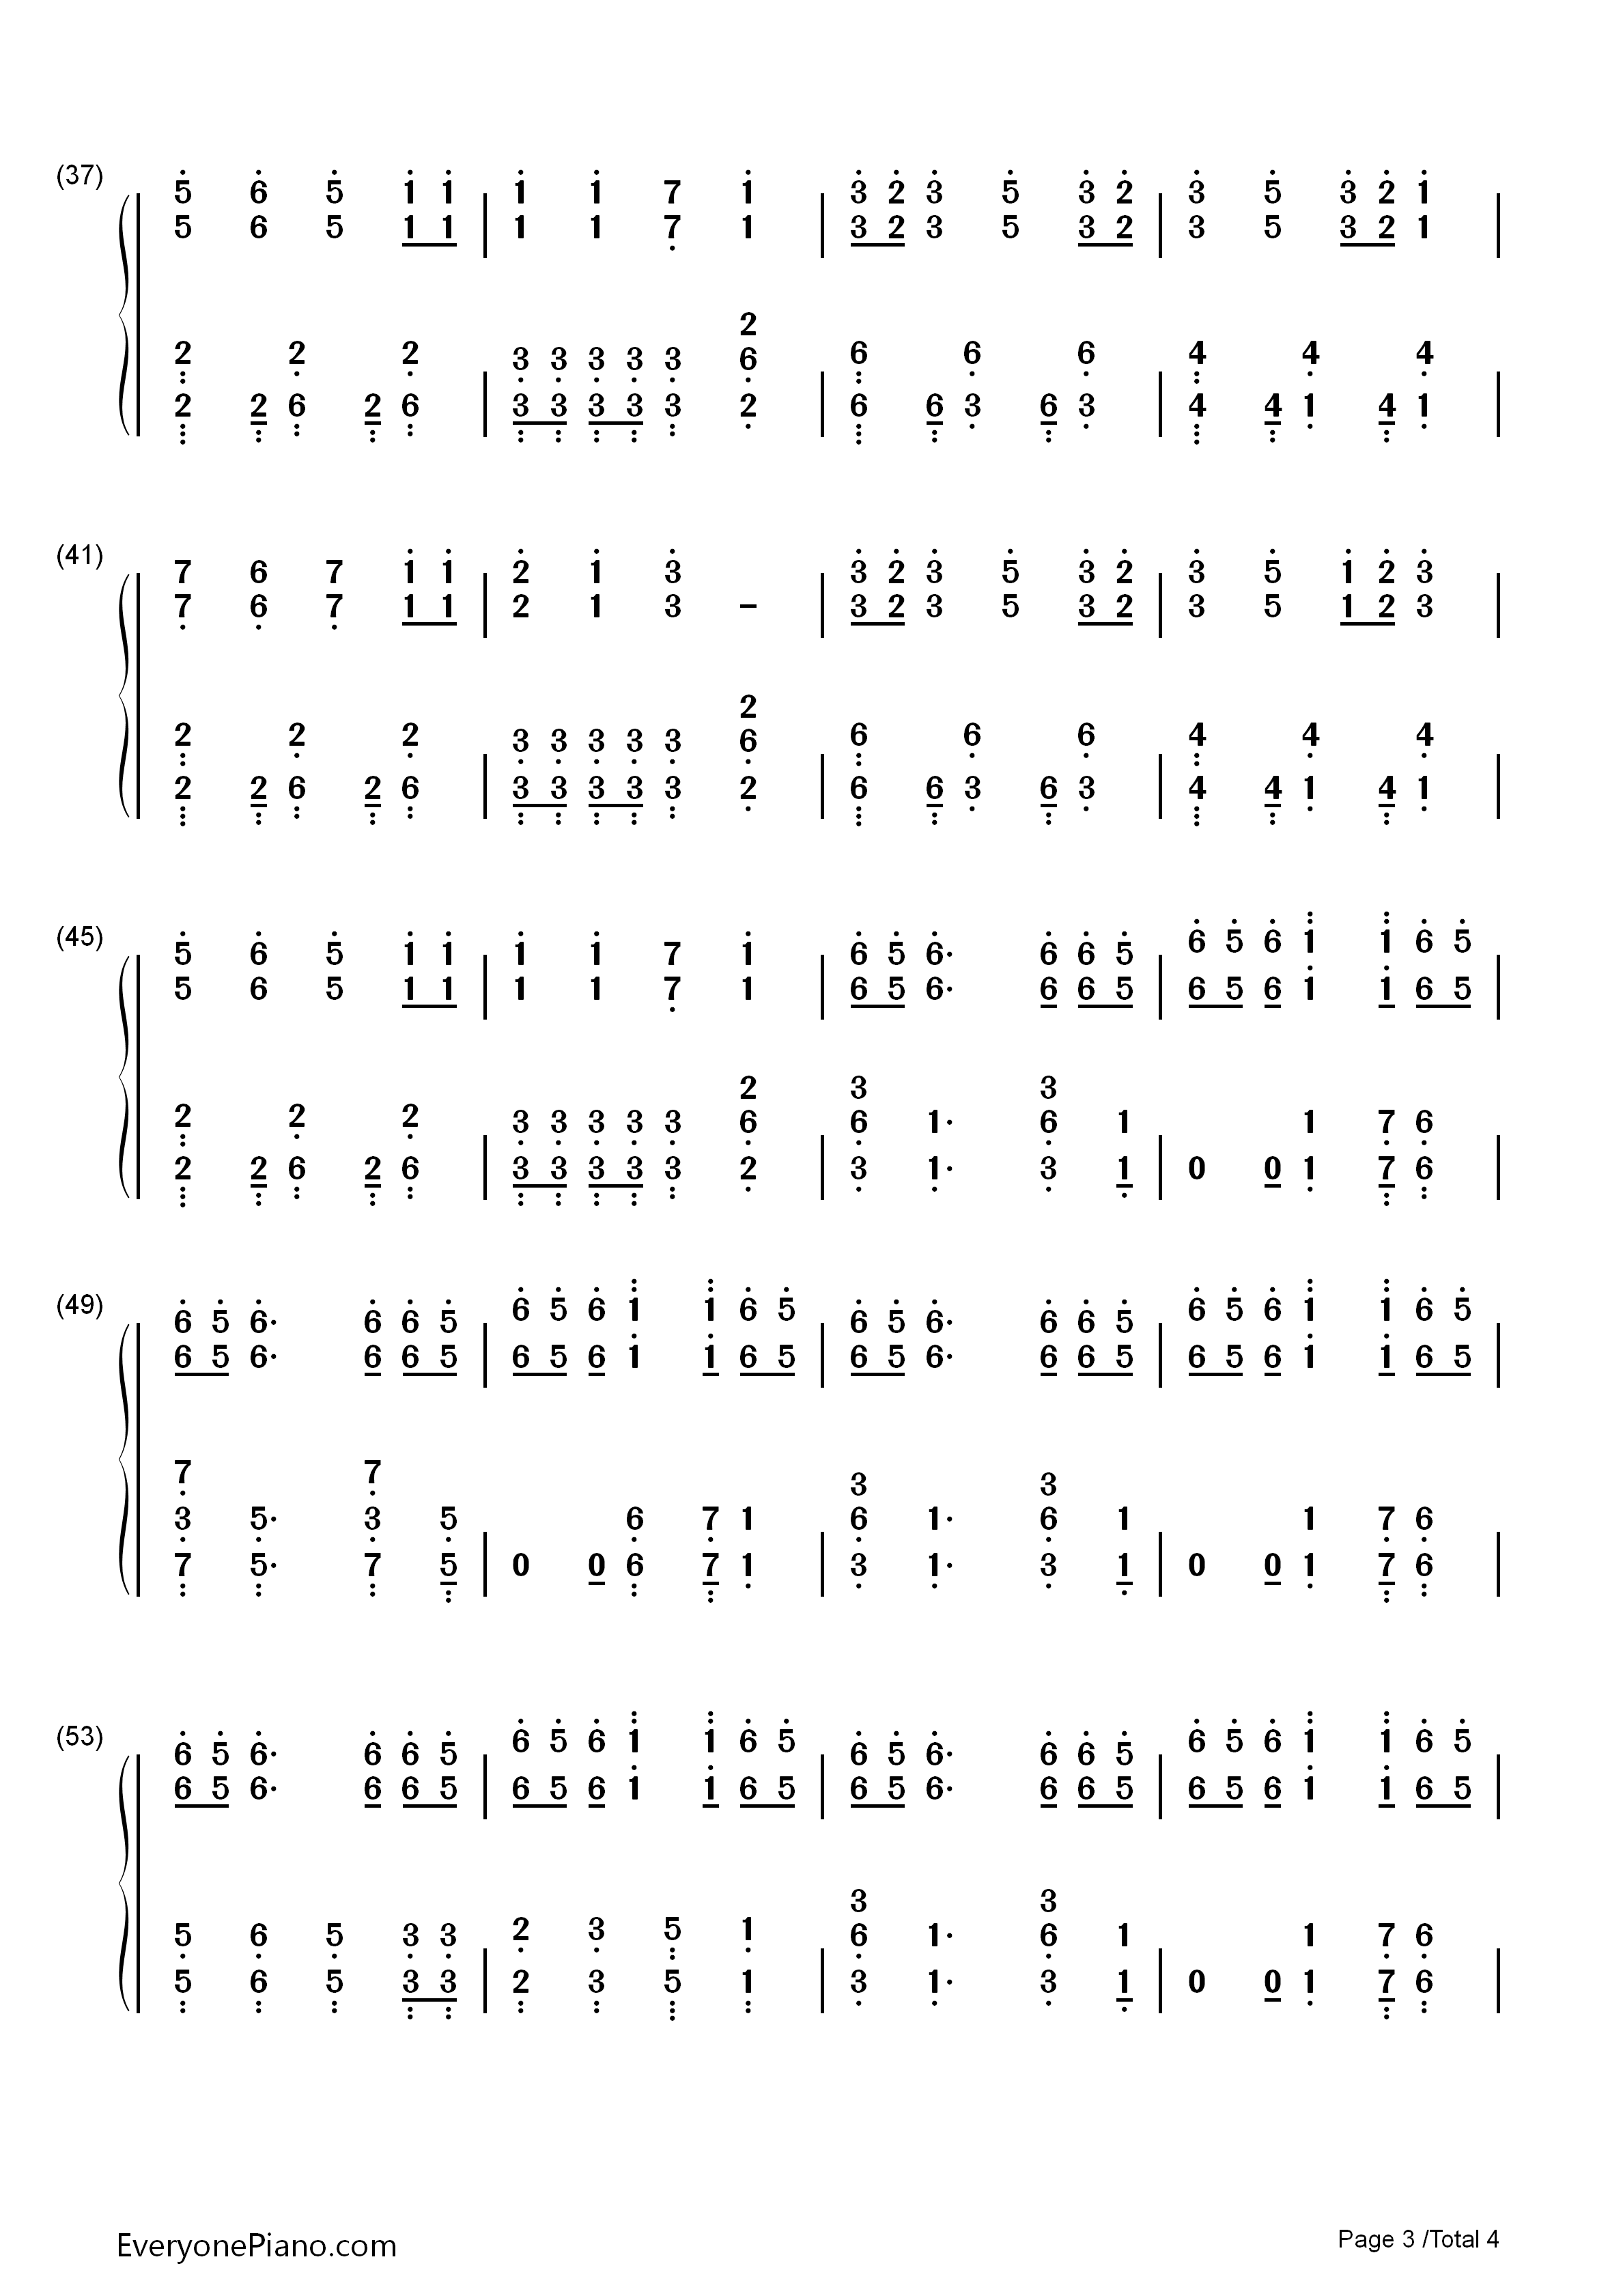 question-暗杀教室第二季op双手简谱预览3-钢琴谱(